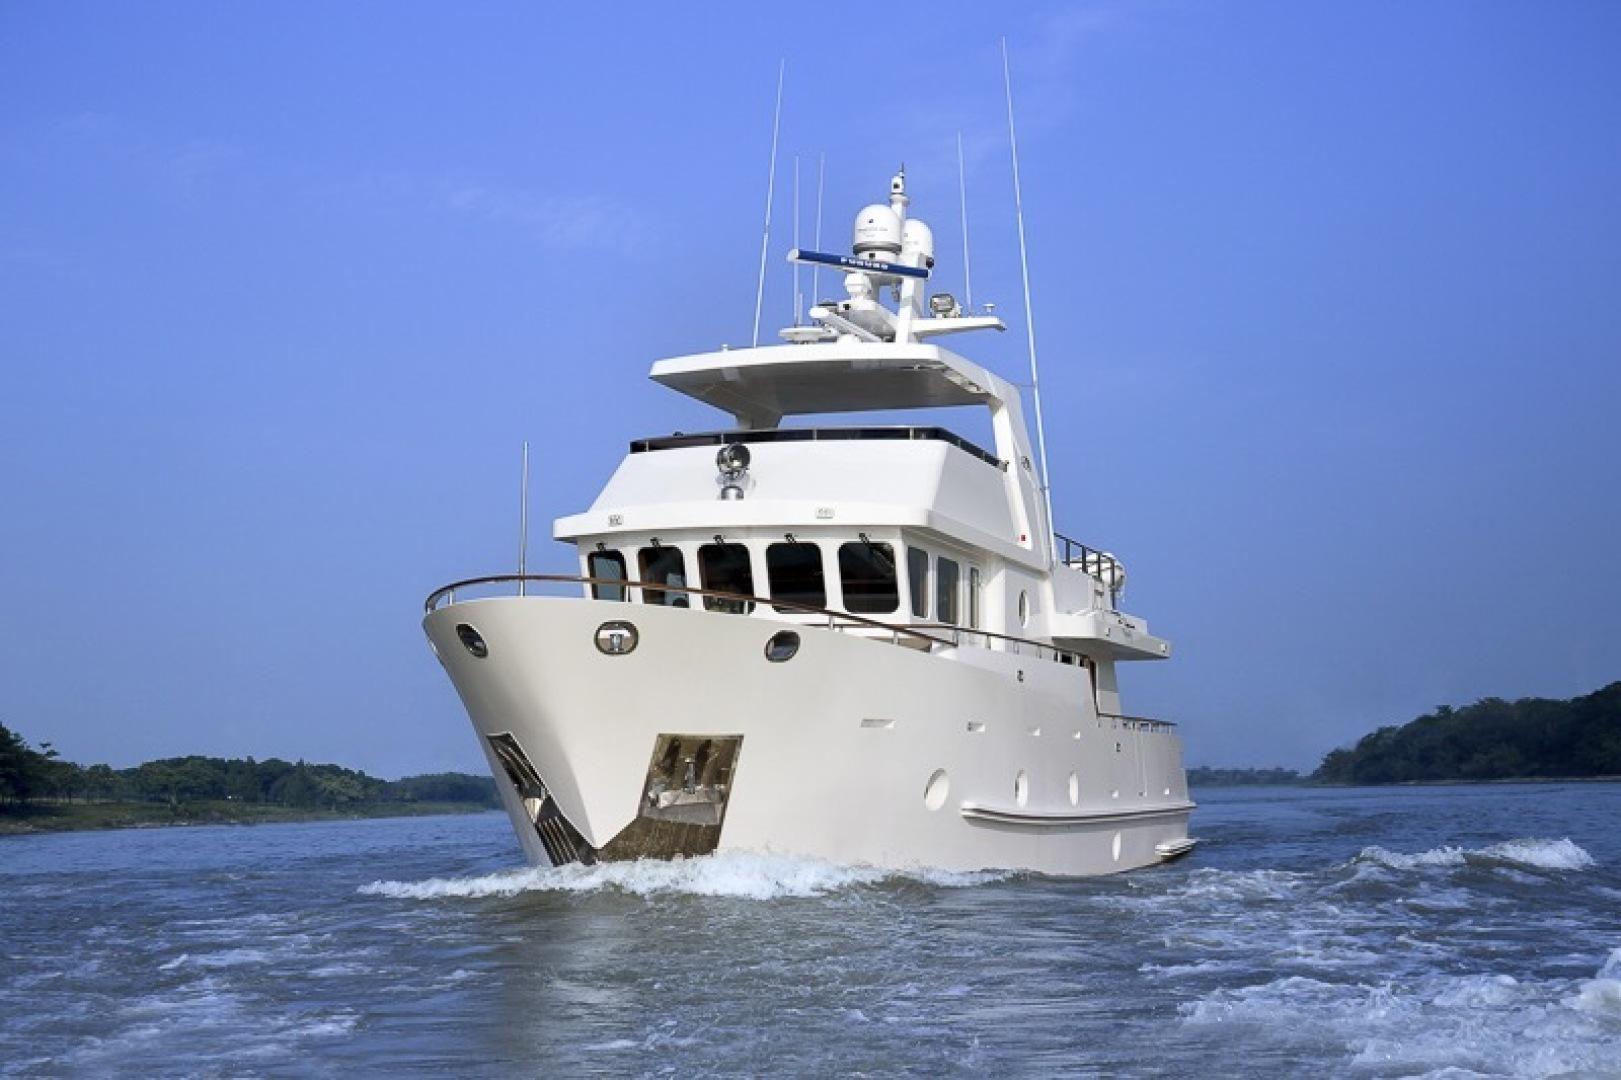 Bering-65 Bering Yacht 2013-Namaste Dania-Florida-United States-1400975   Thumbnail